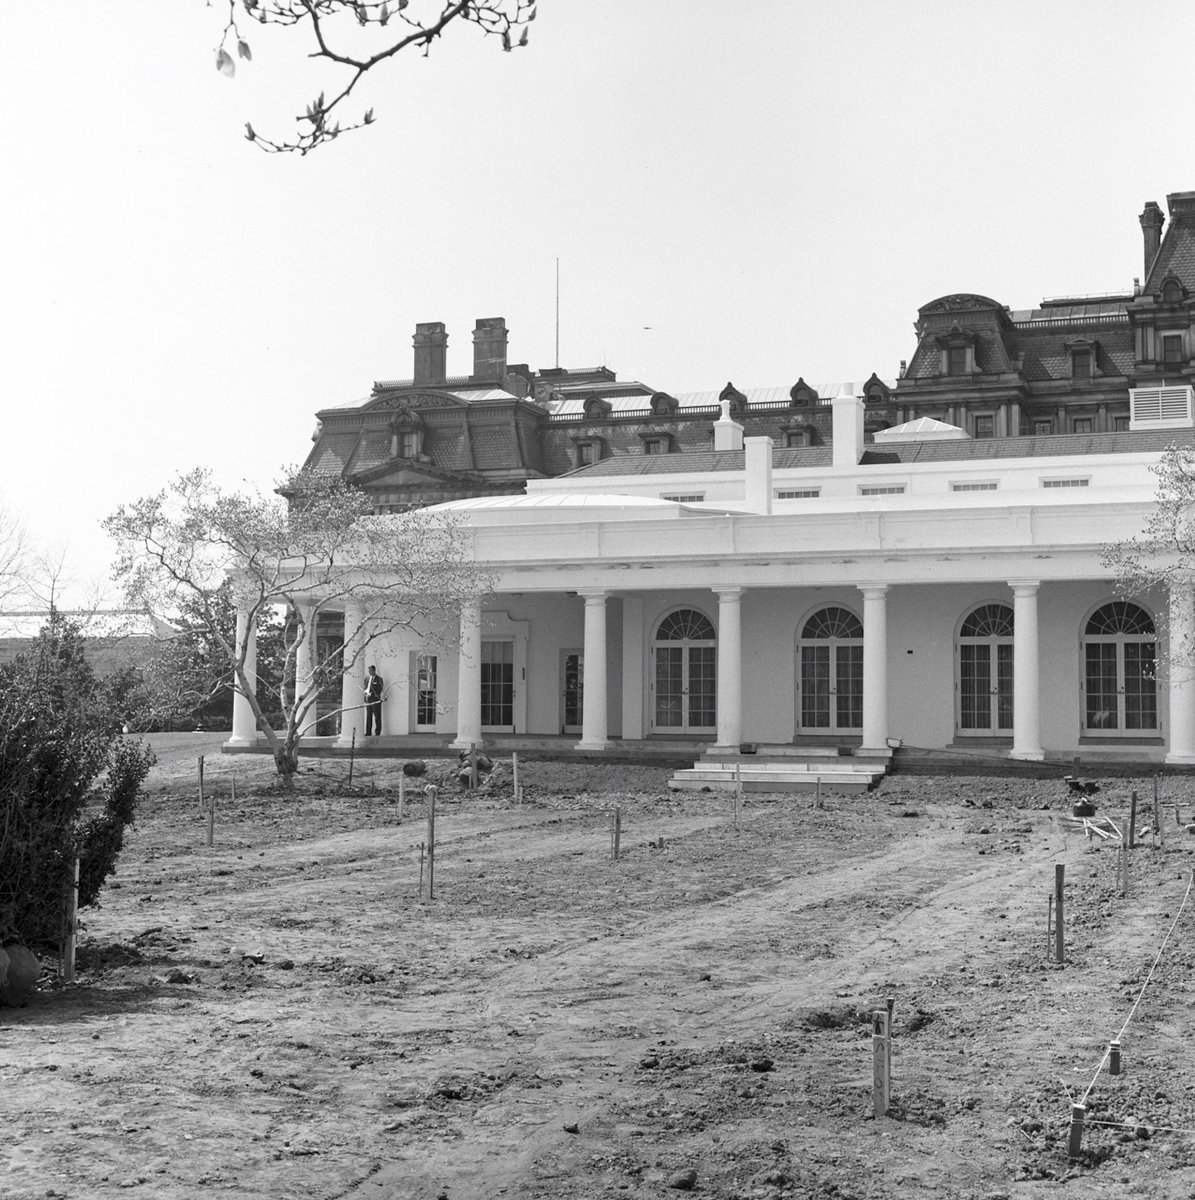 White House Rose Garden being reconstructed, 1962: #JFKL